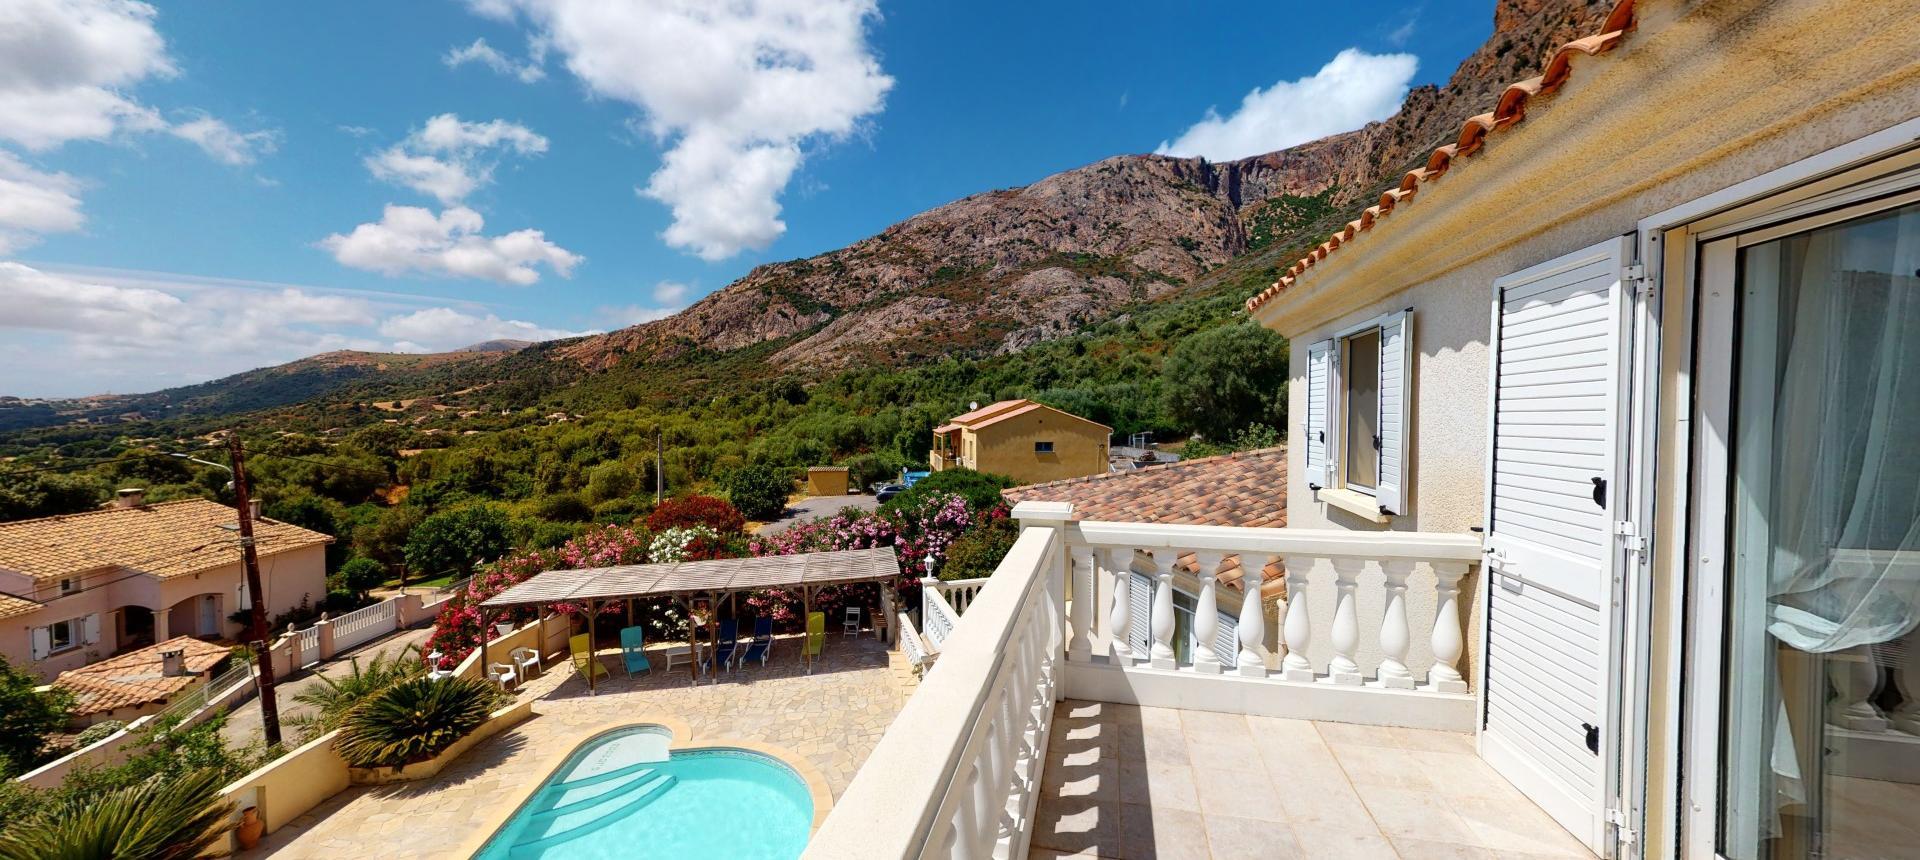 A vendre villa avec vue dégagée proche Ajaccio - AFA-TERRASSE R+1